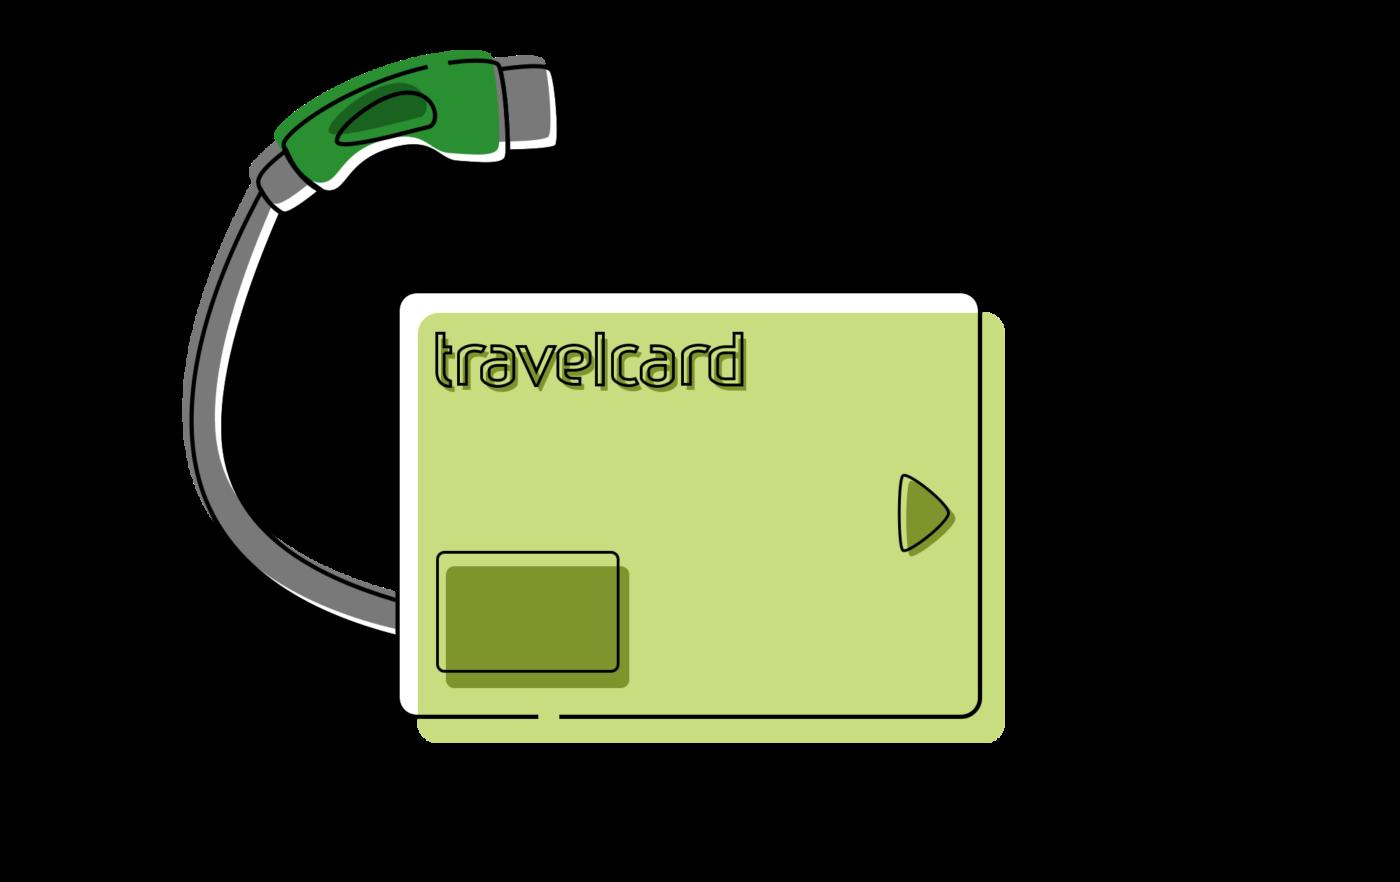 Travelcard